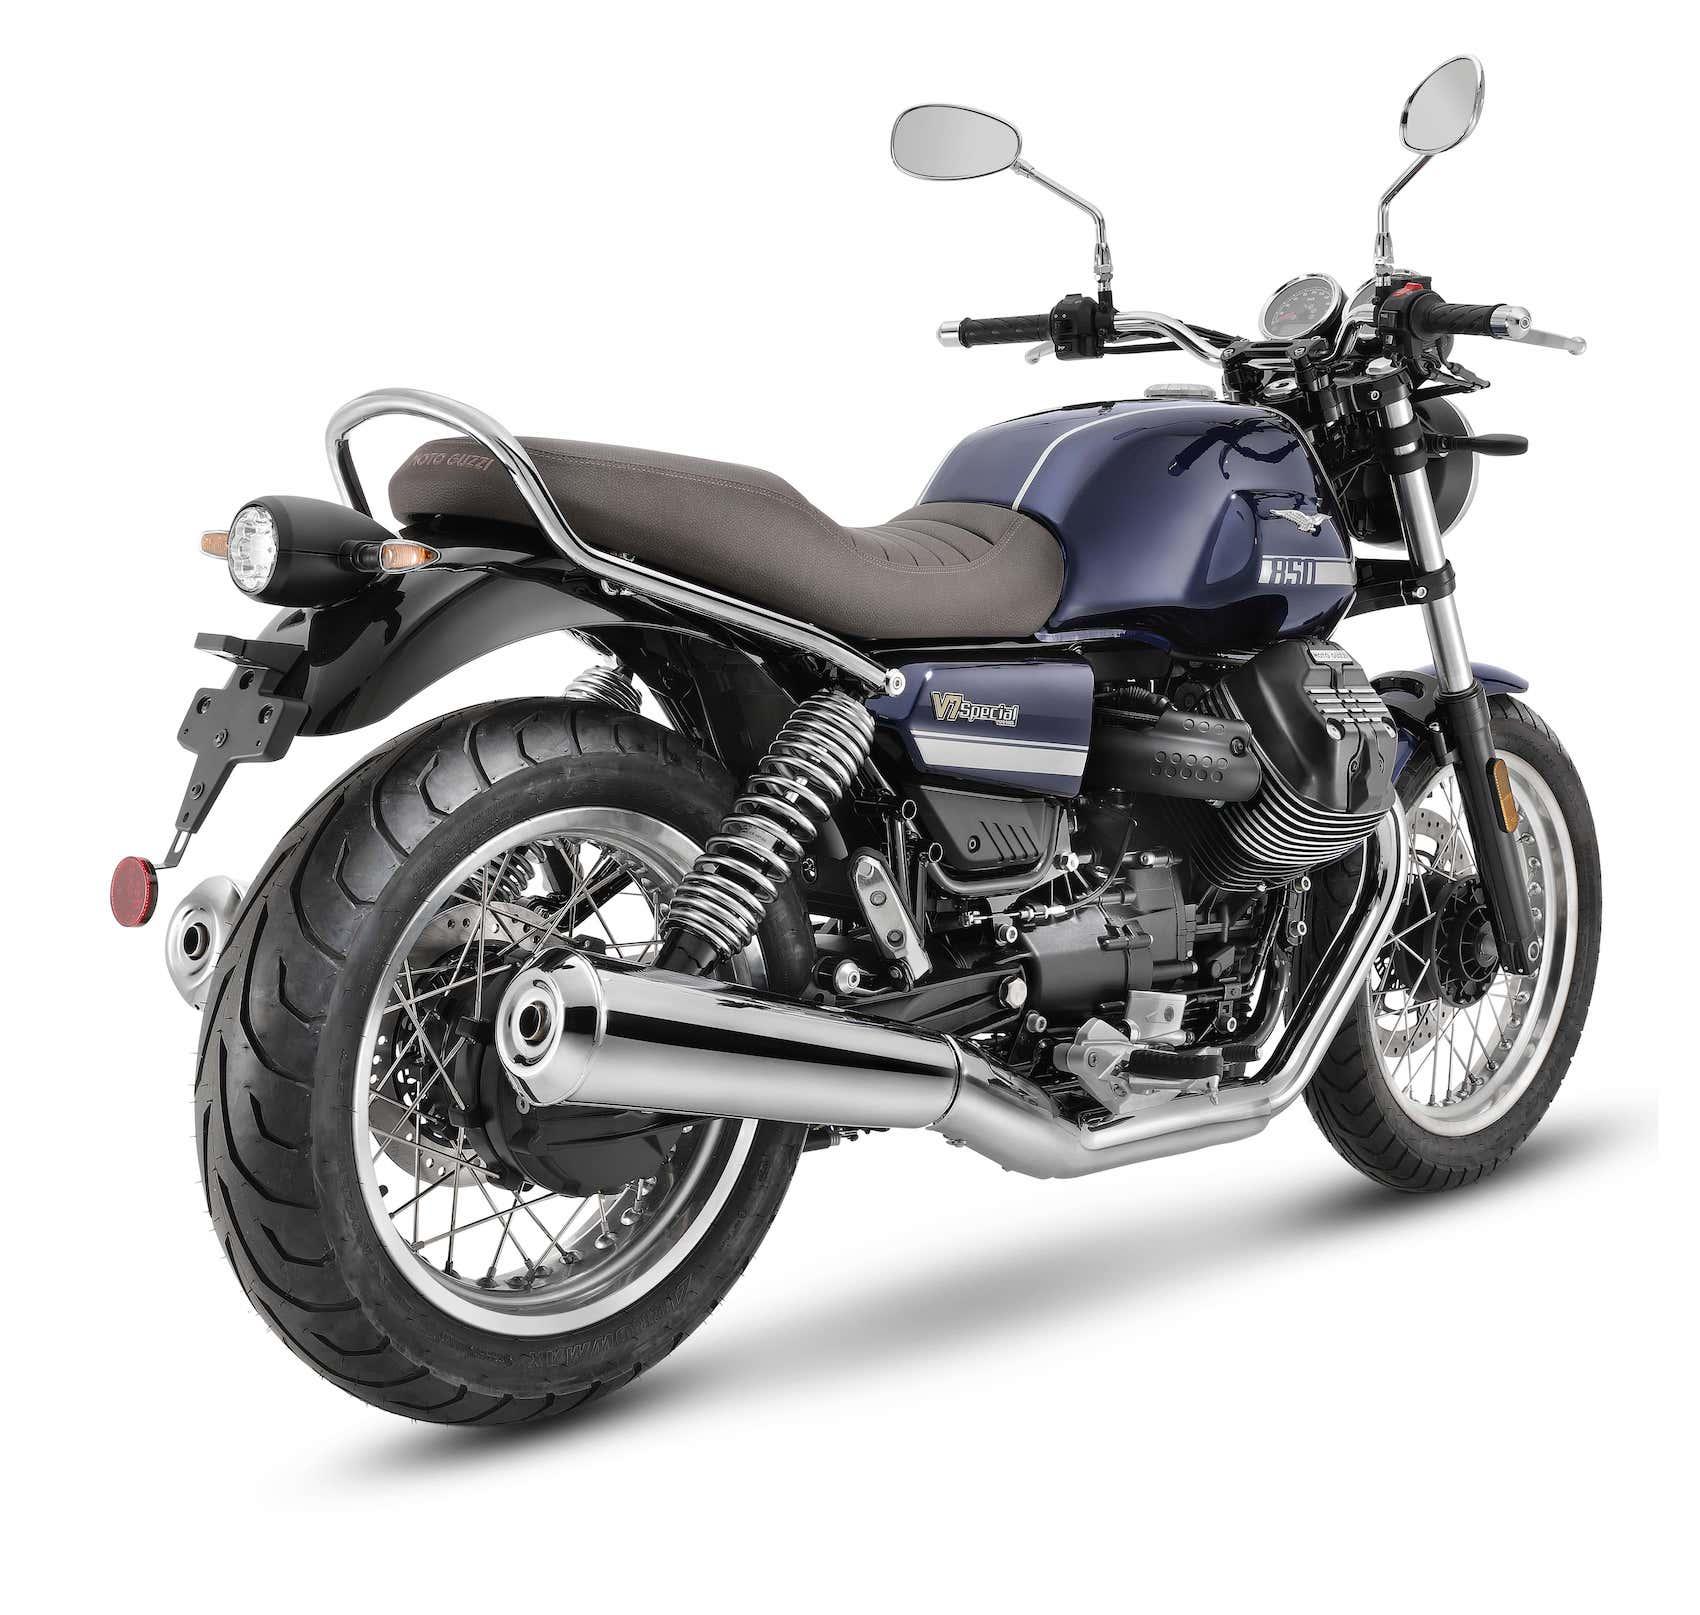 Moto Guzzi V7 Special 2 min